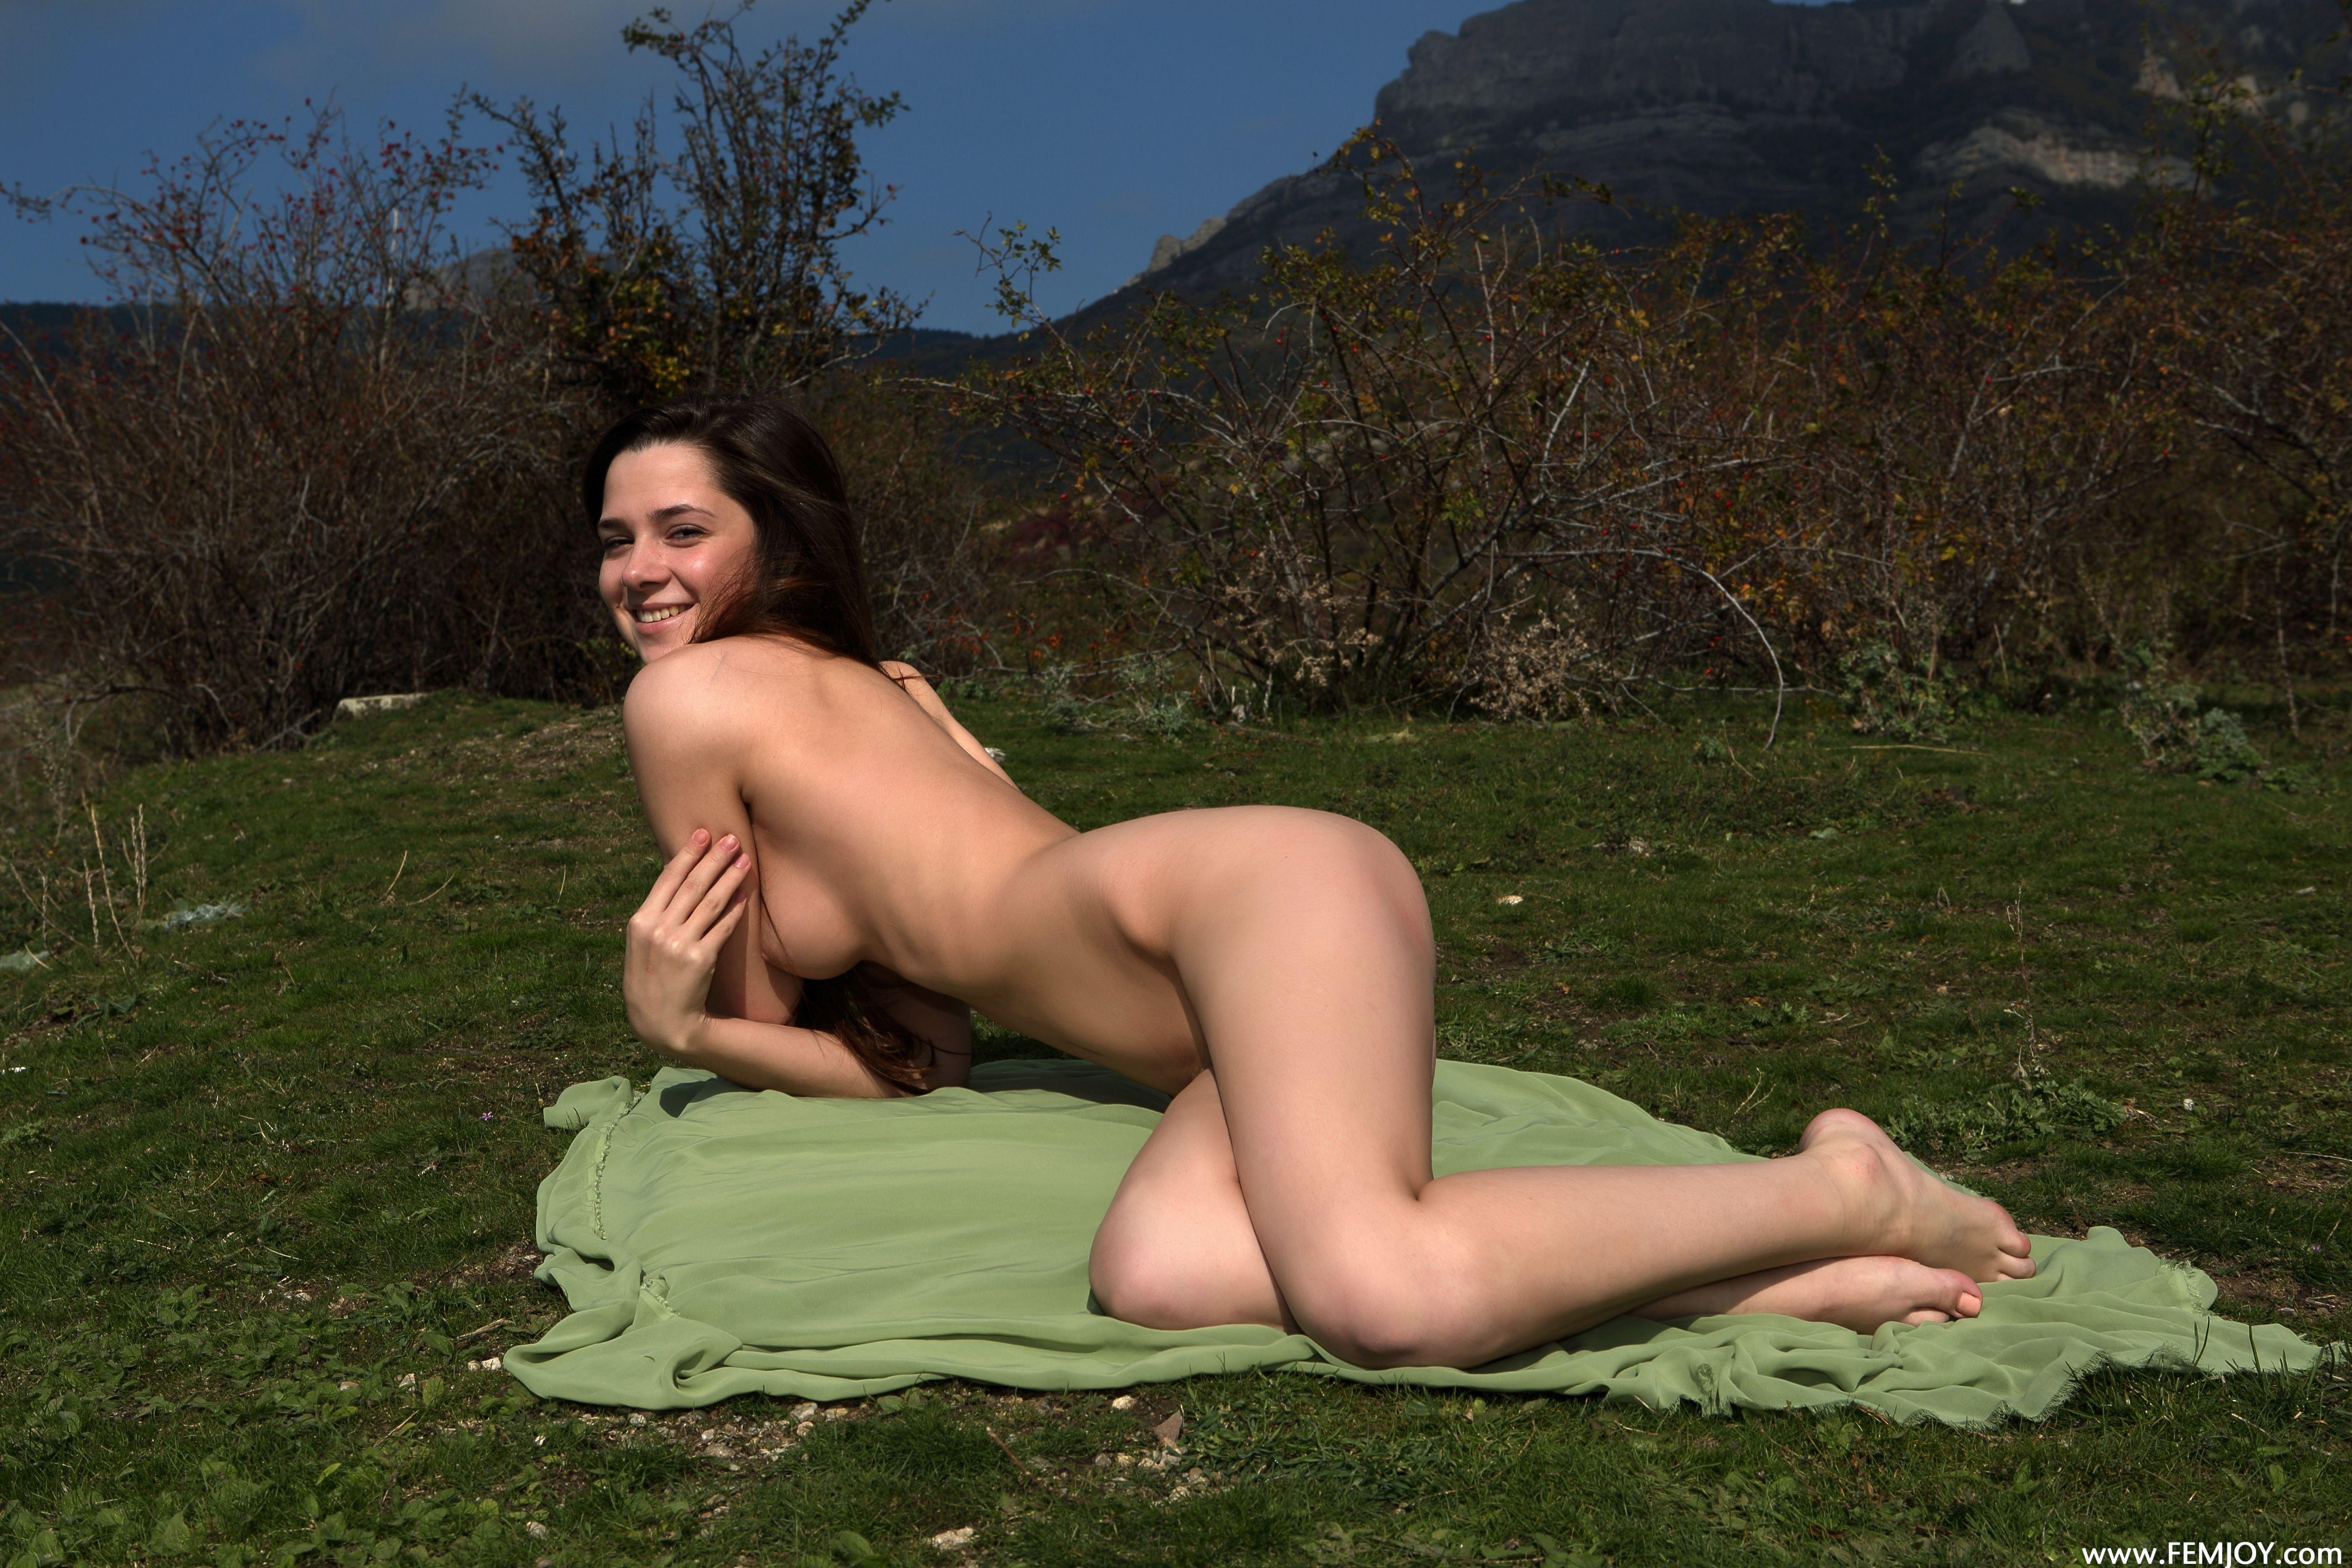 Download Photo 5000X3333, Eva U, Brunette, Sexy Girl, Nude -6304